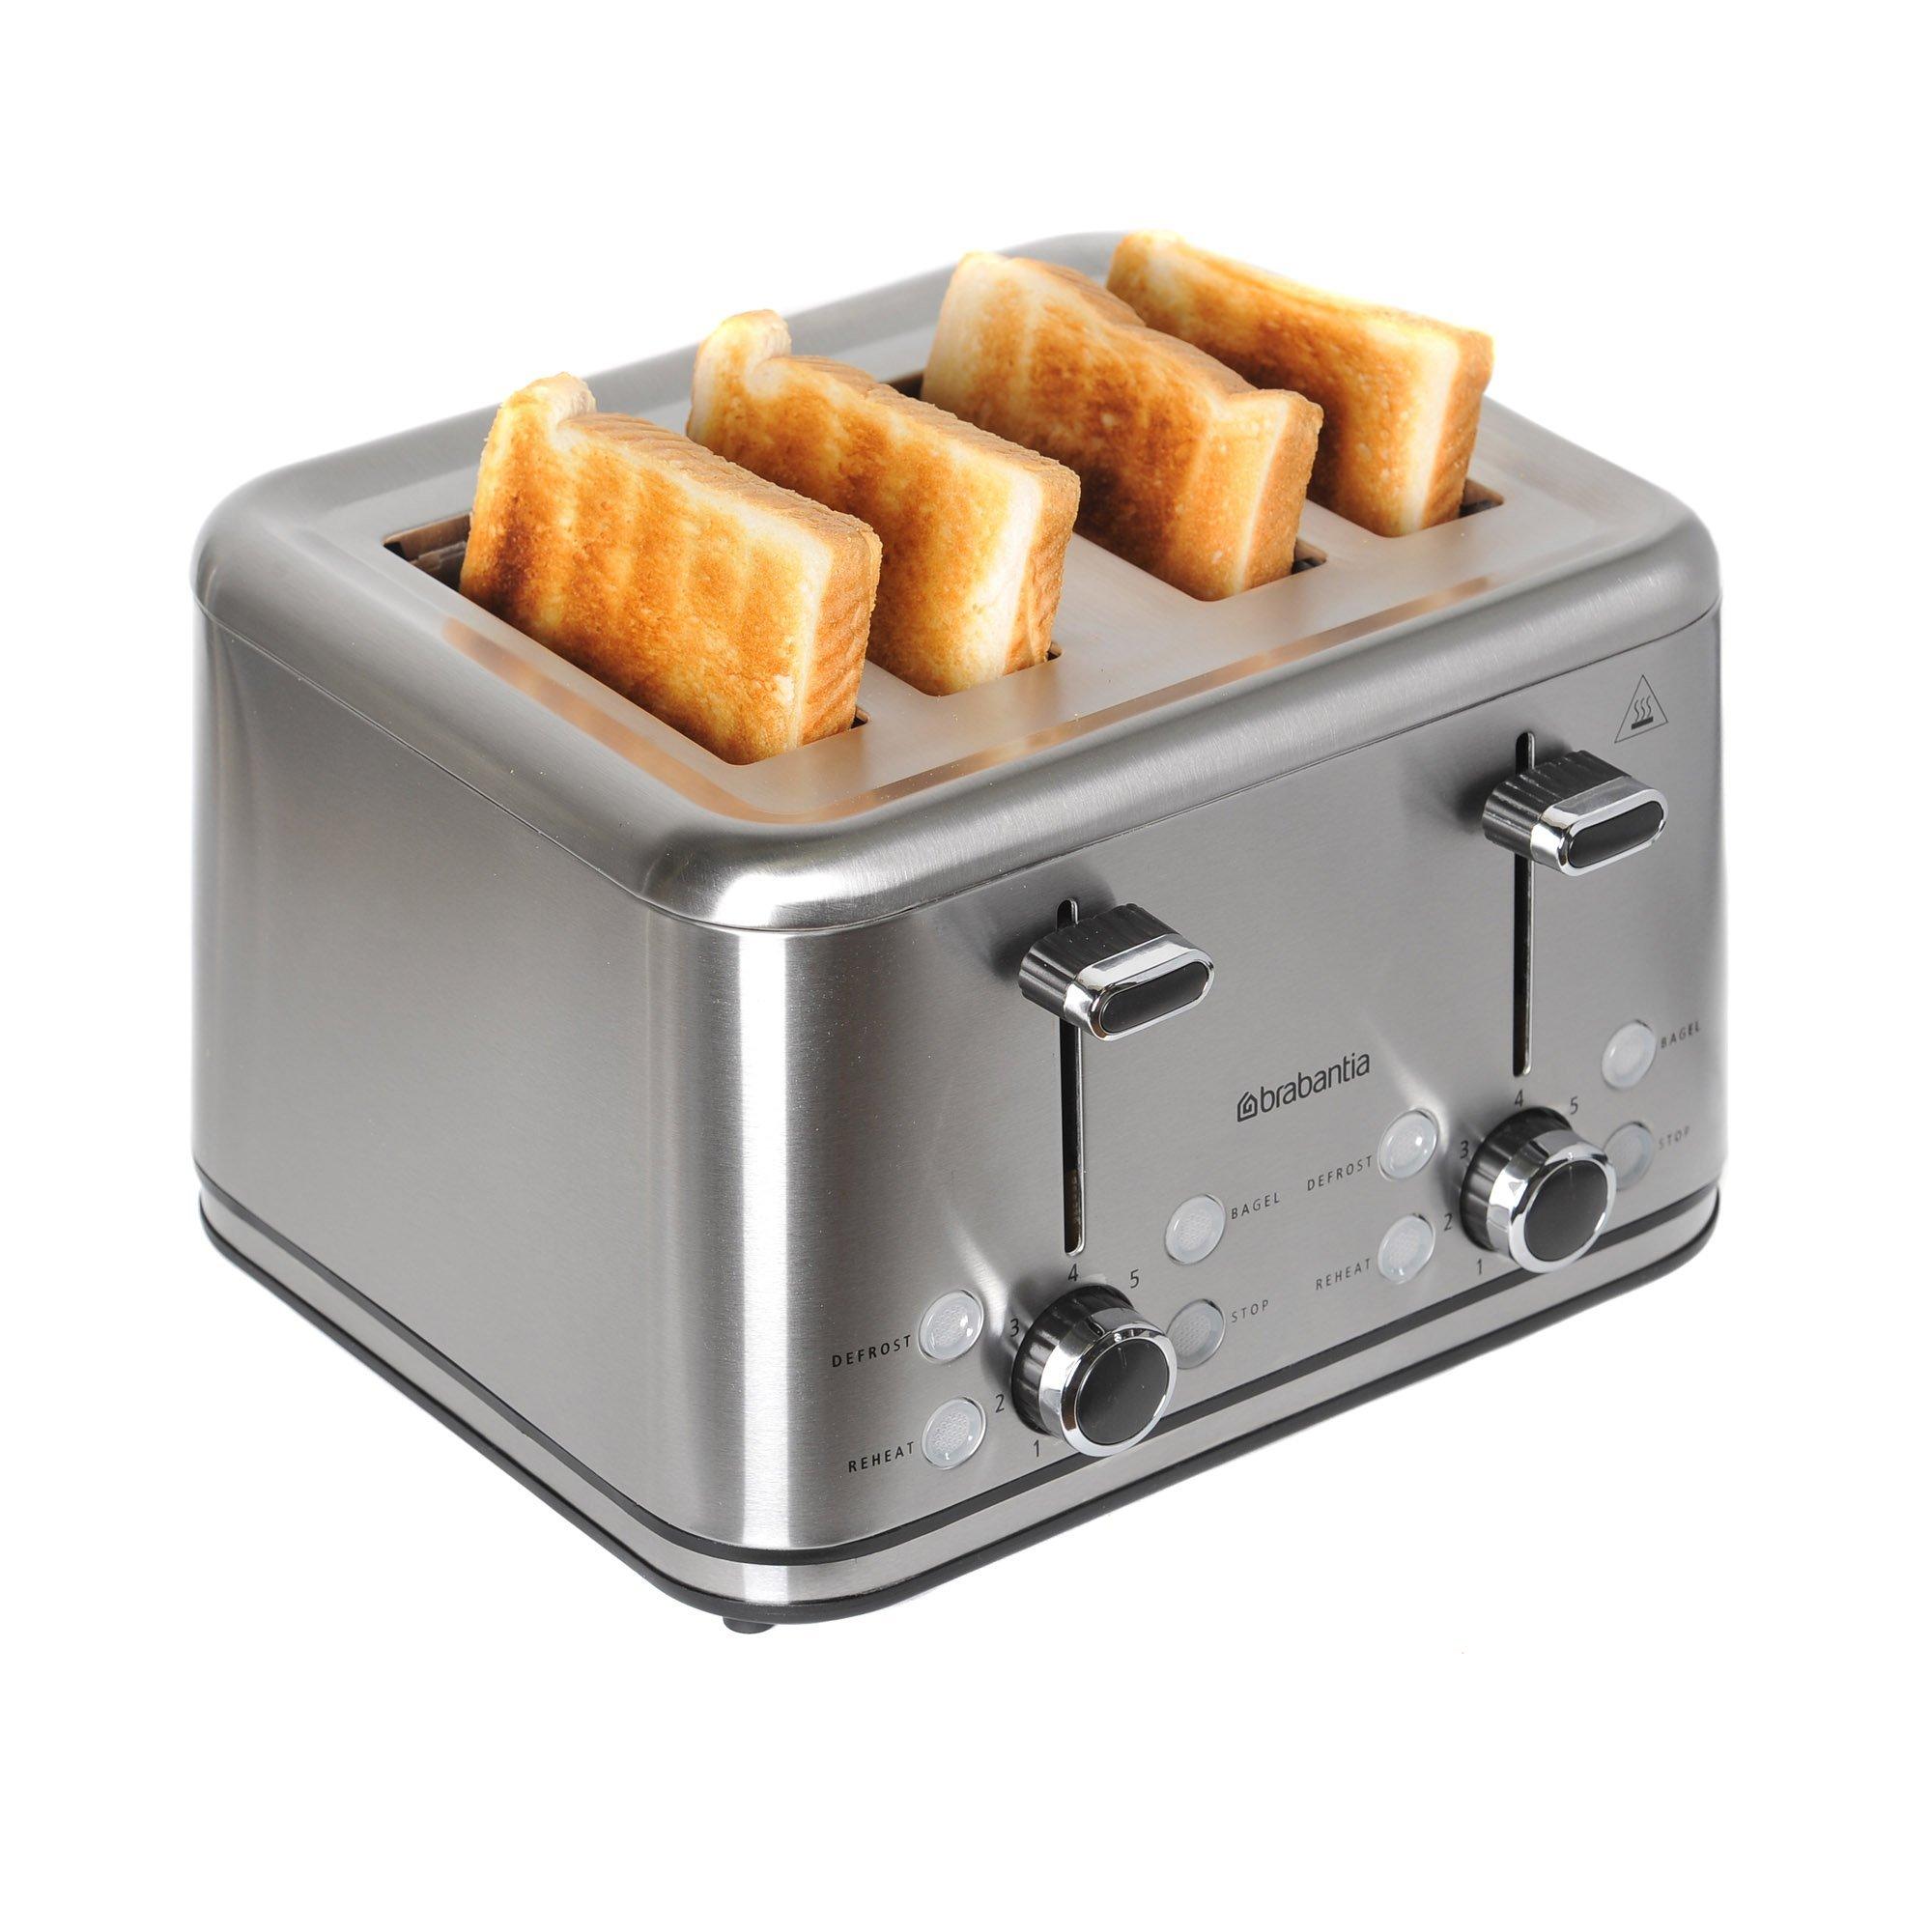 Brabantia BBEK1031 Four Slice Stainless Steel Toaster by Brabantia